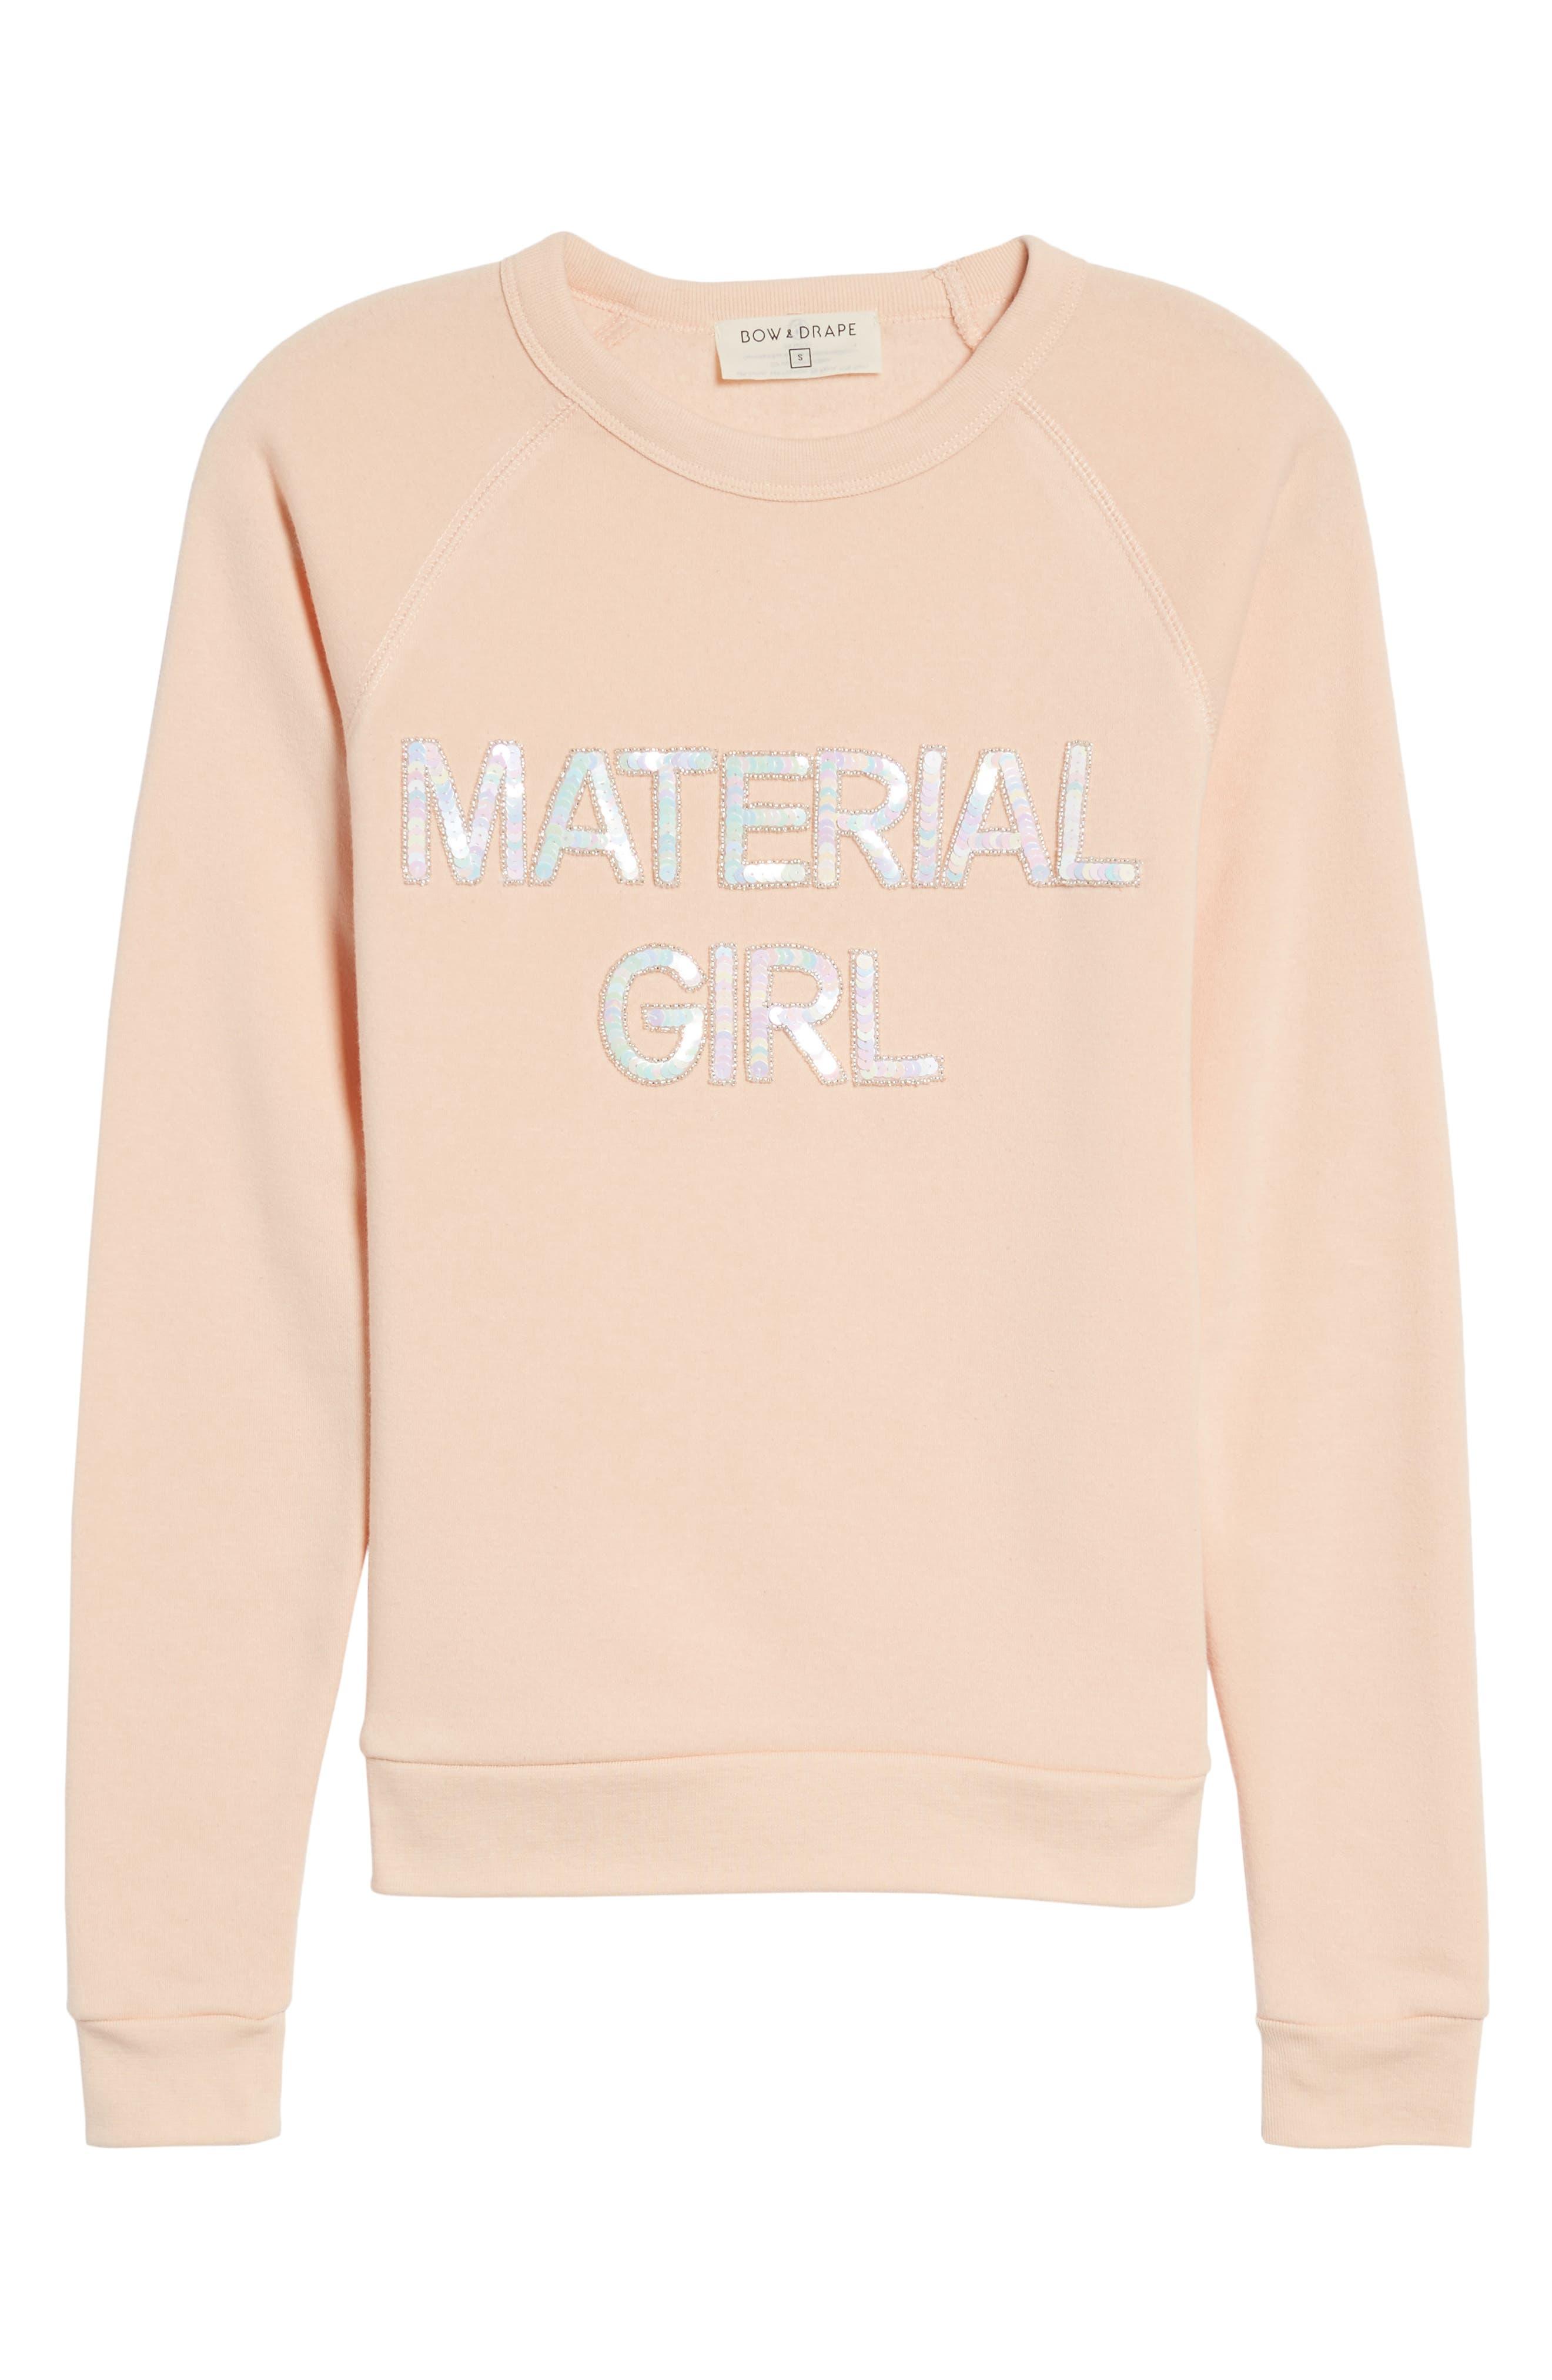 Material Girl Sweatshirt,                             Alternate thumbnail 6, color,                             Blush